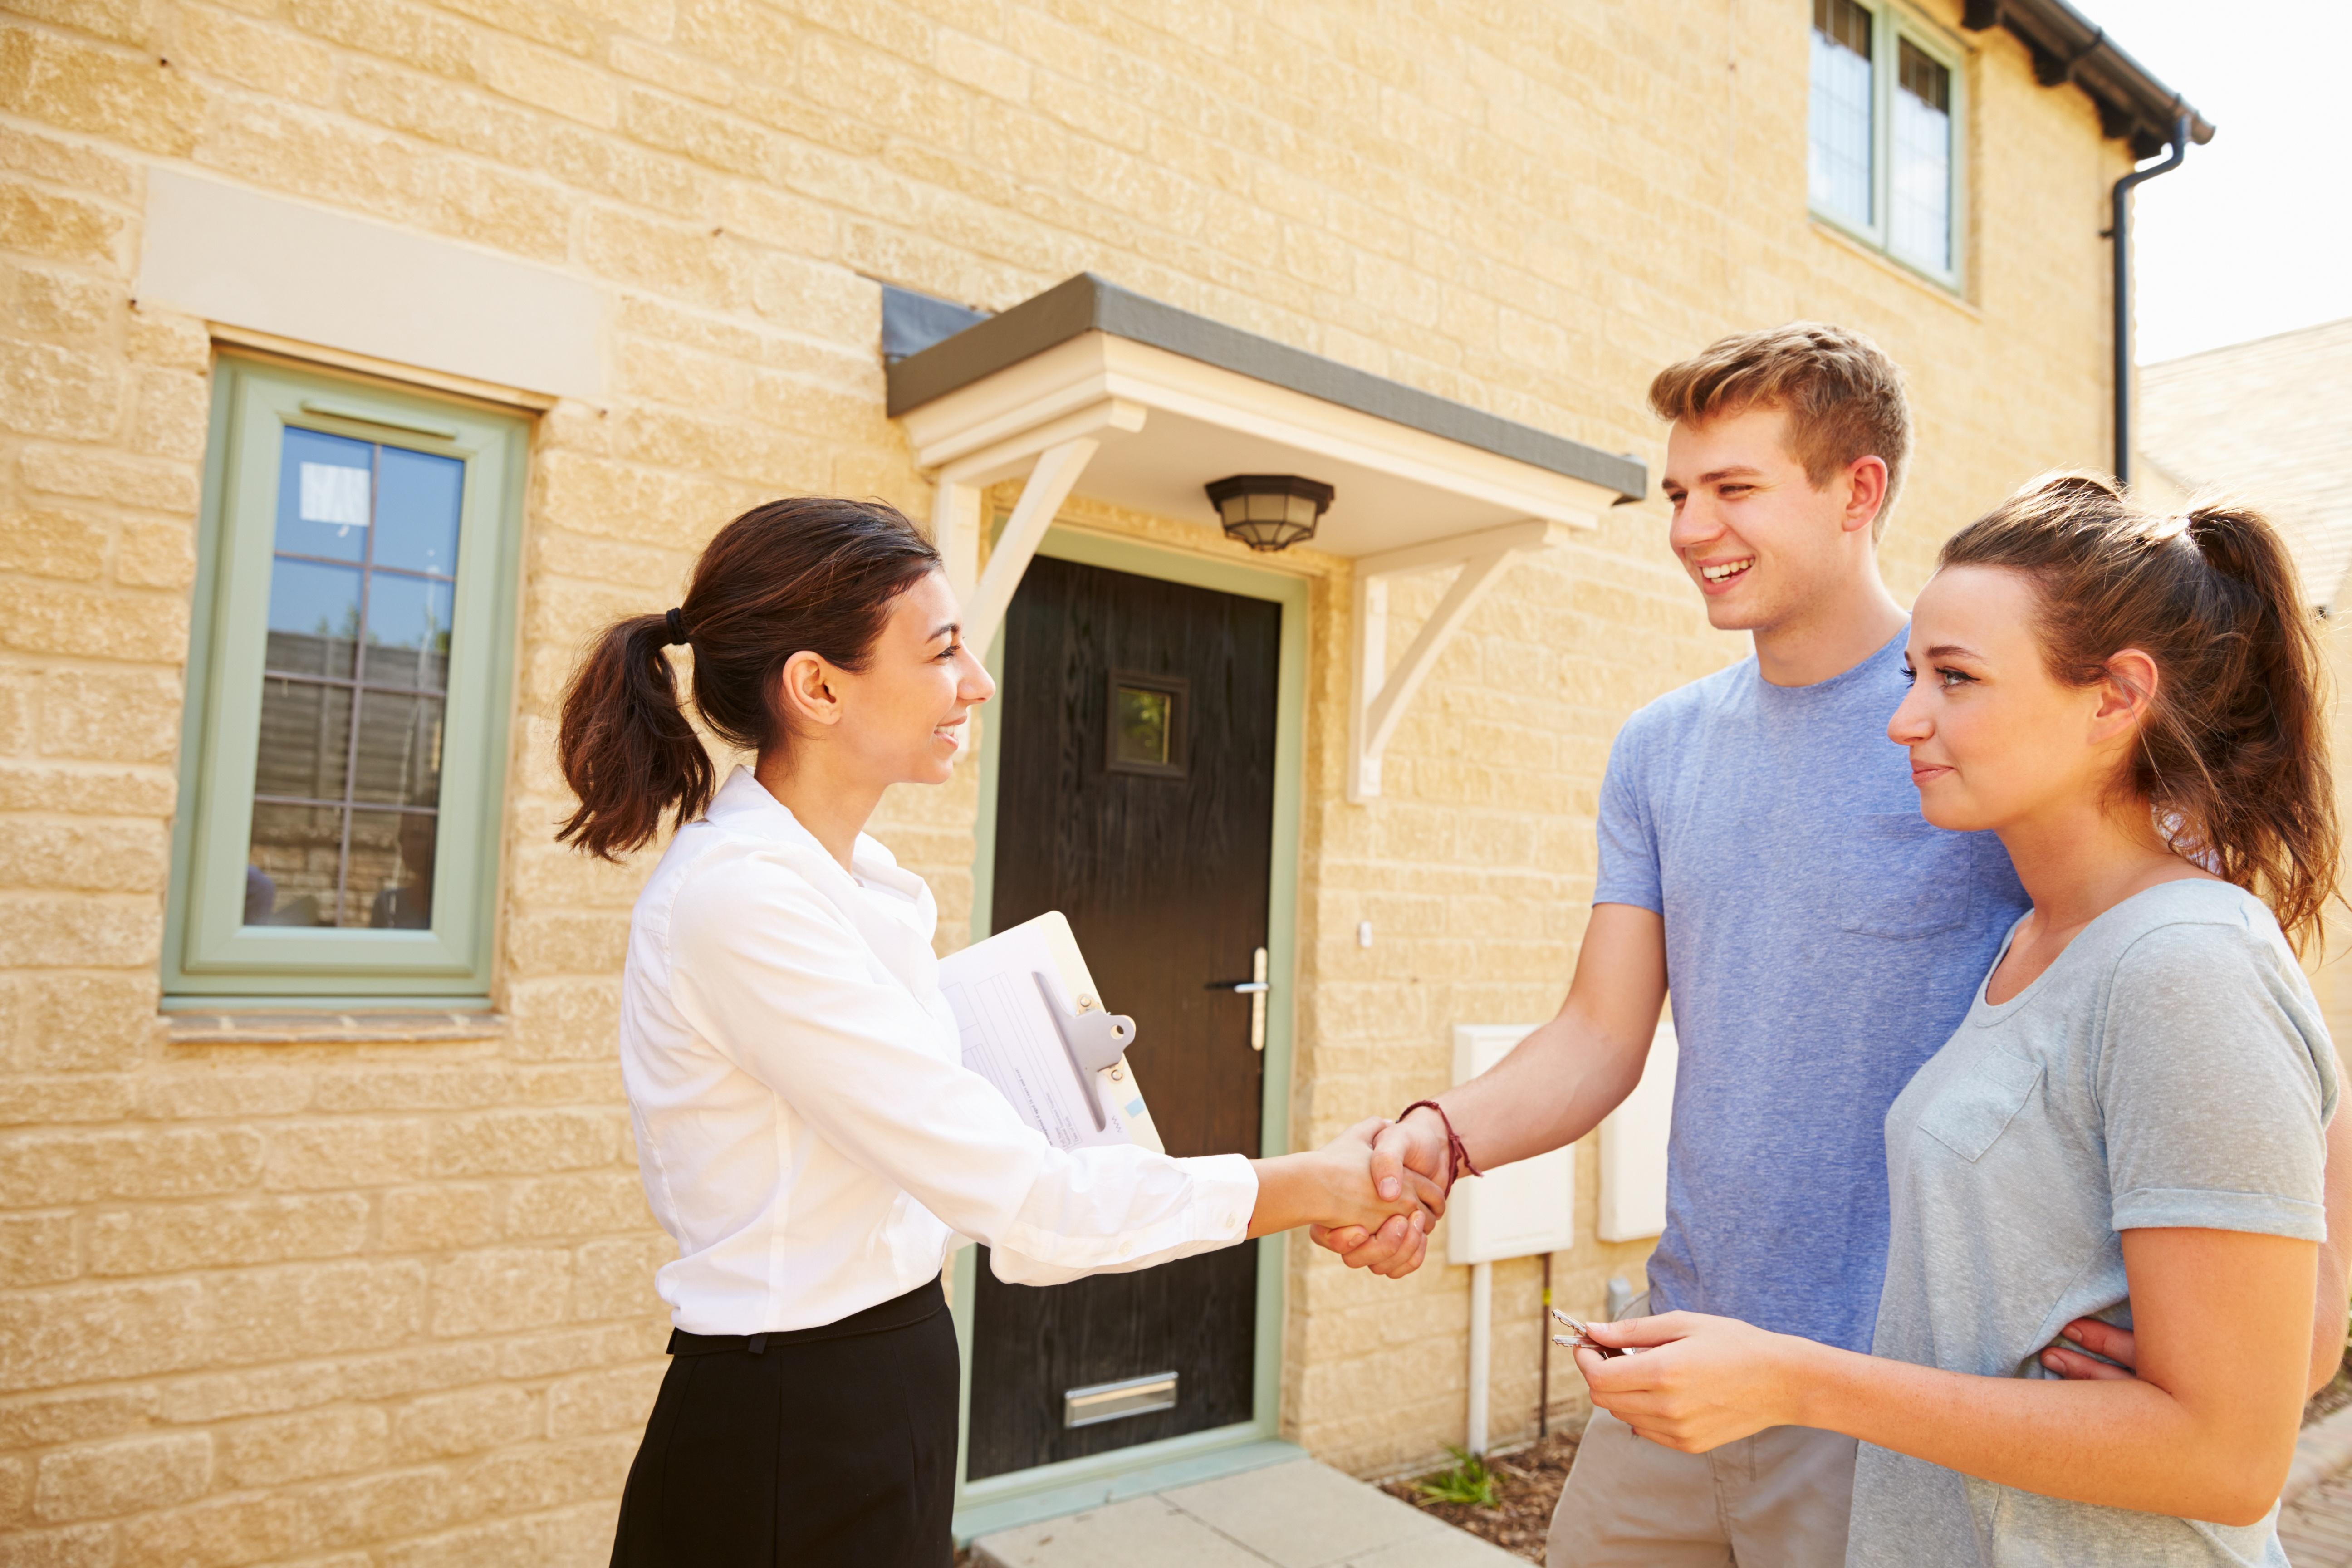 bigstock-Real-estate-agent-shaking-hand-102025619-1.jpg